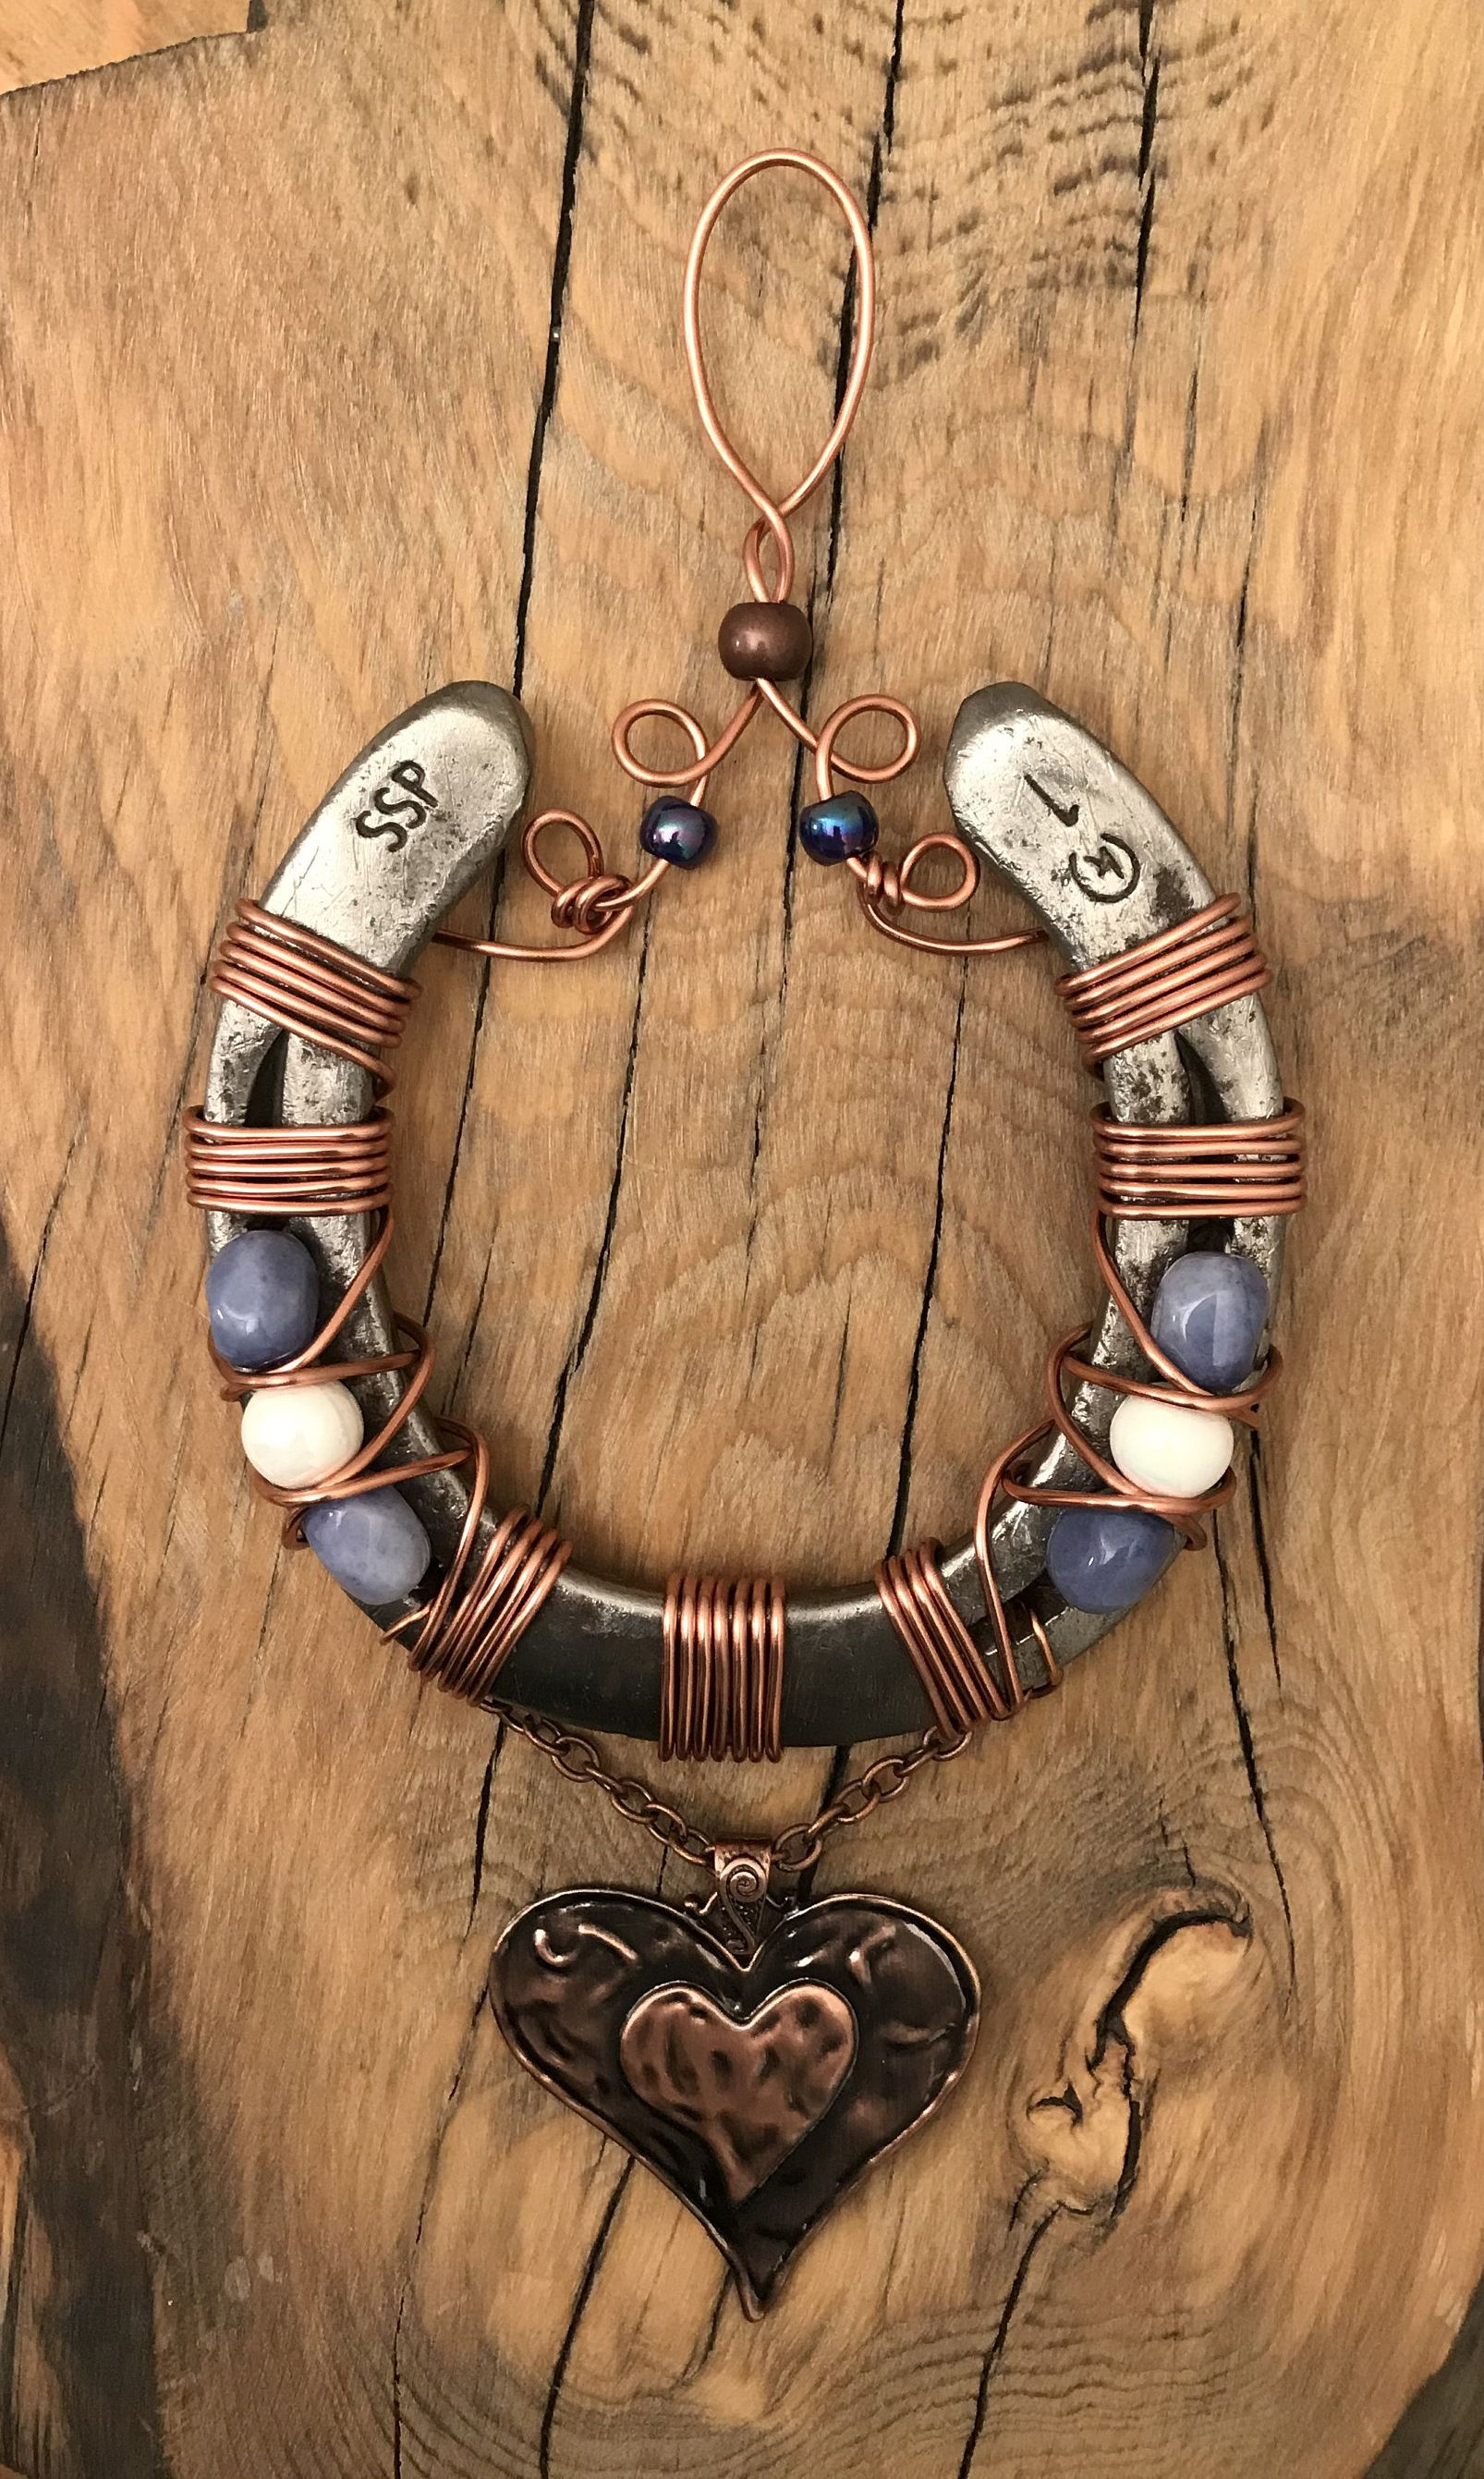 Sterling Silver Spacer,Charm for Bracelet,Lucky,Farmer,Cowboy Horseshoe Bead